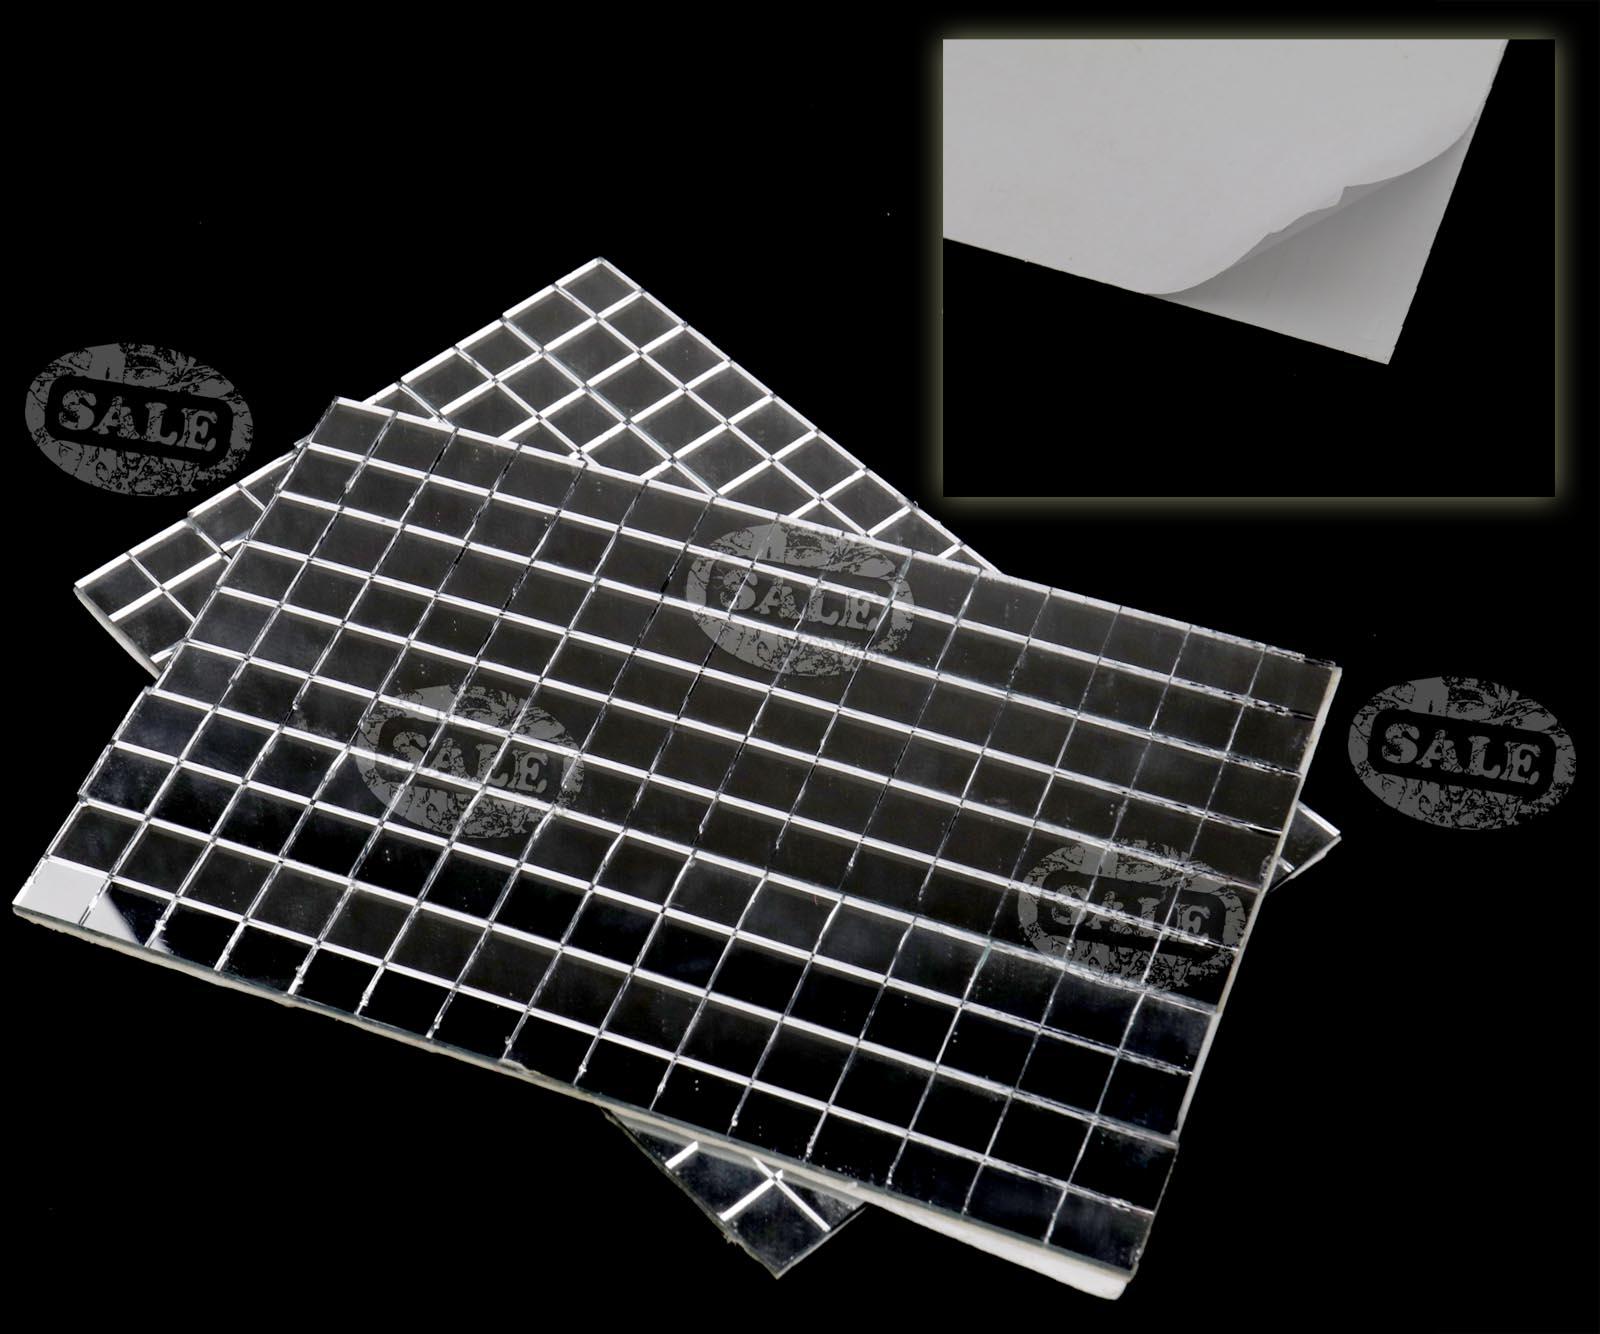 5x 150 silver self adhesive mirror mosaic tile mirror for Perfekt mosaik bordure